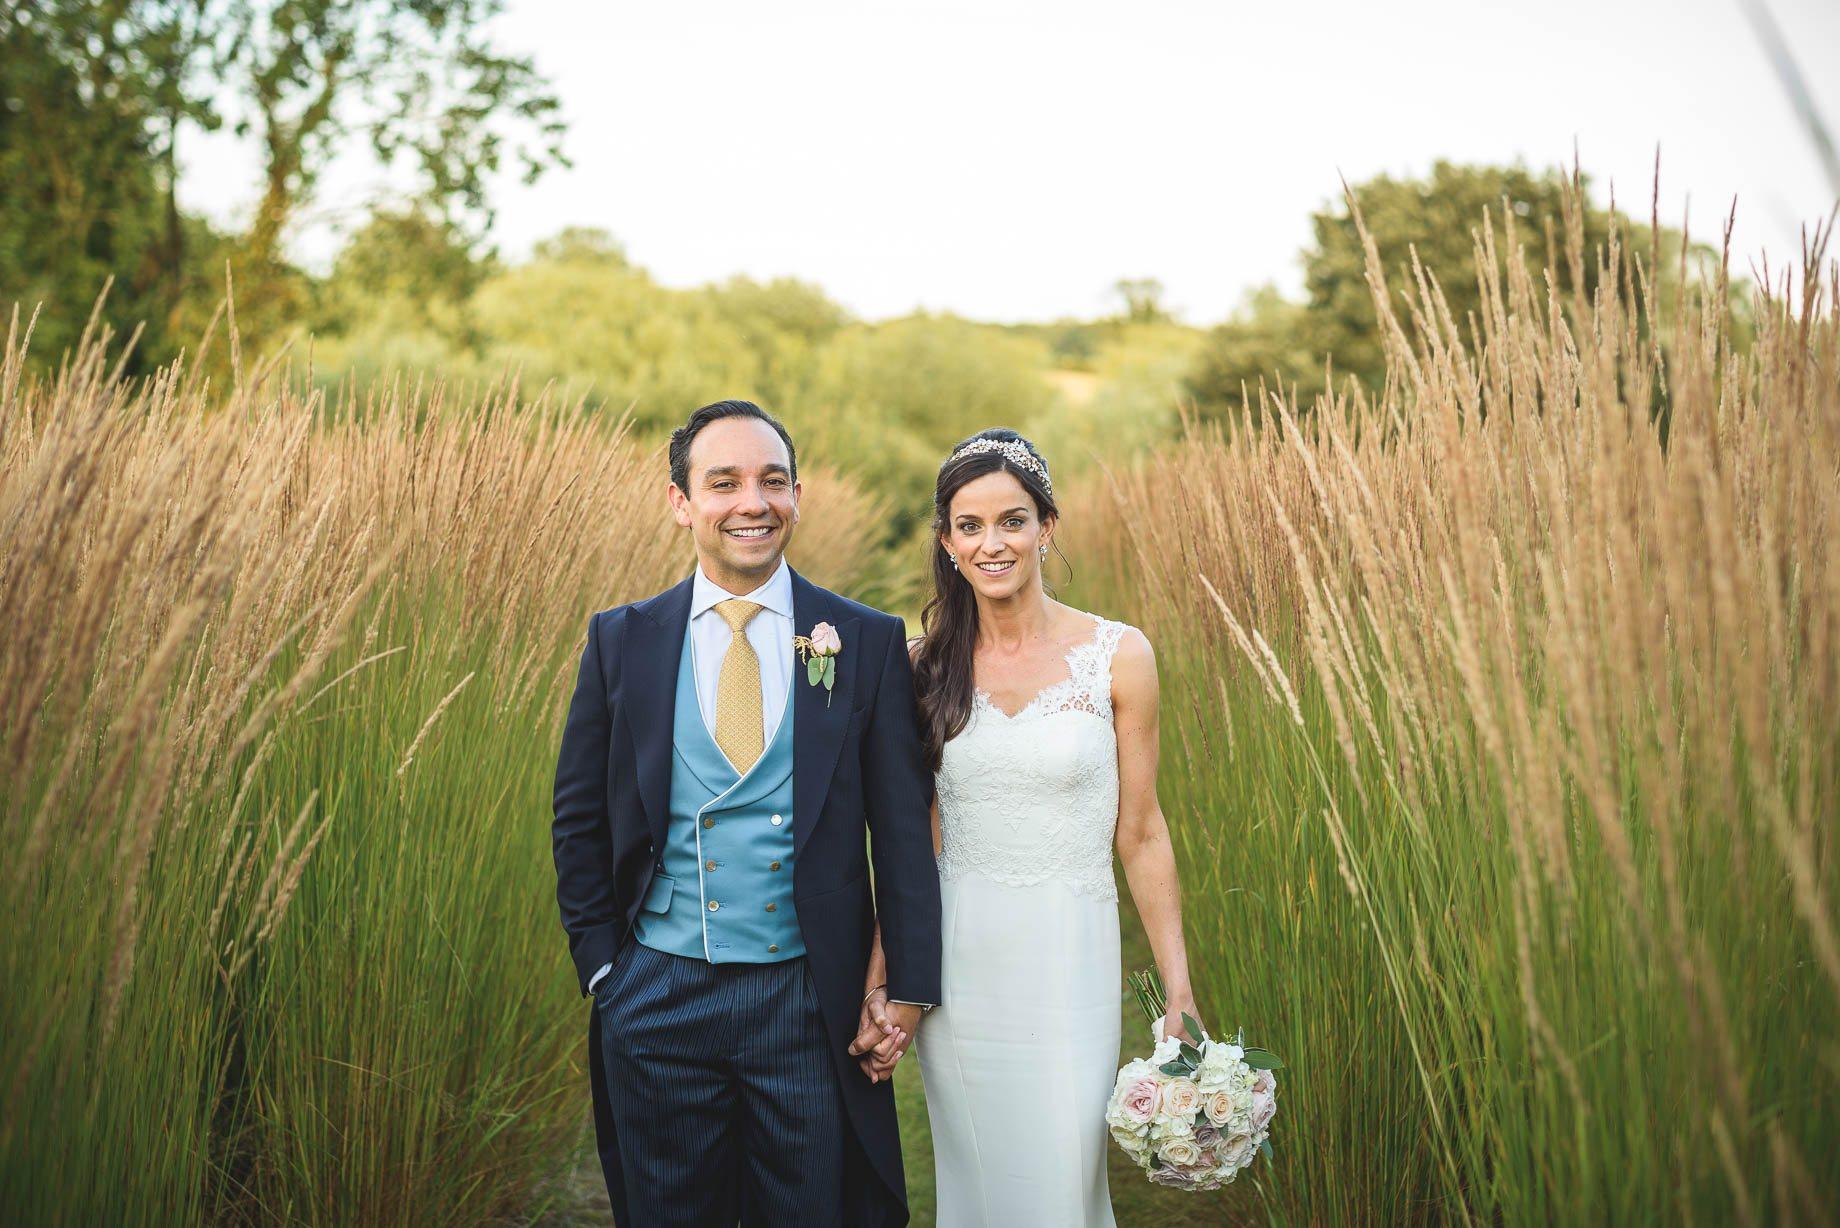 Bury Court Barn Wedding Photography - Caroline and Rob (184 of 219)